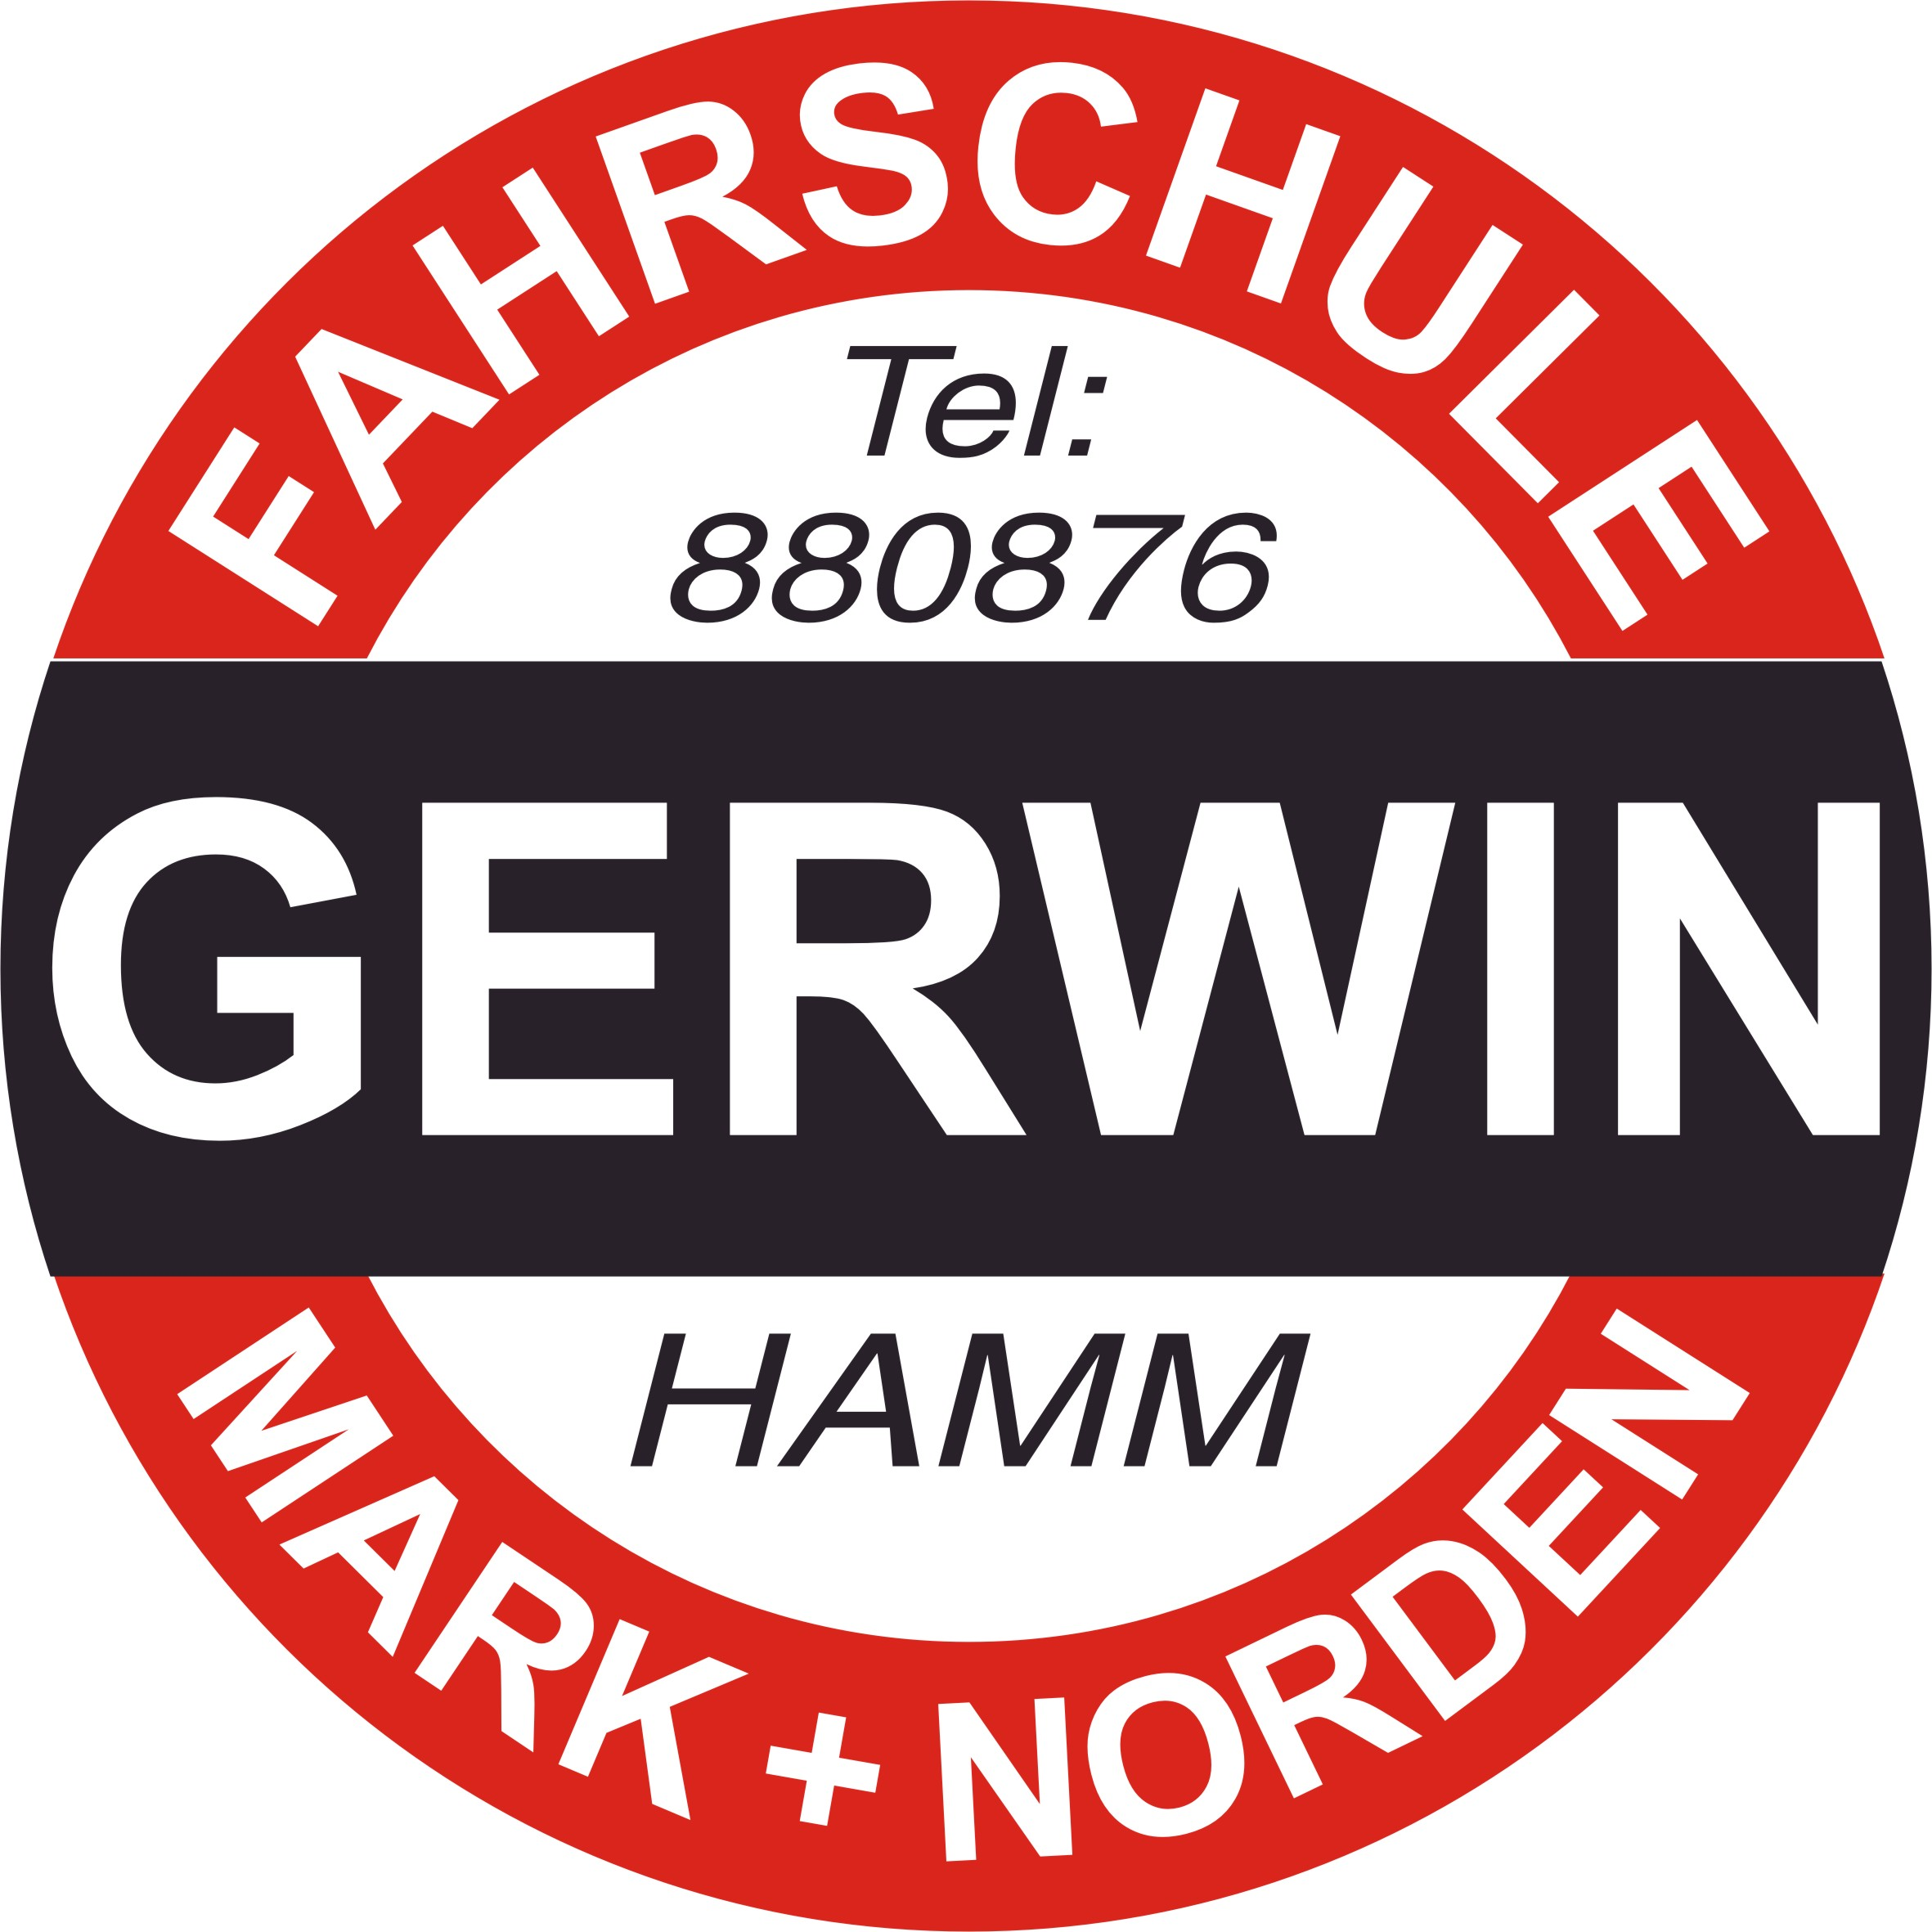 Fahrschule Gerwin